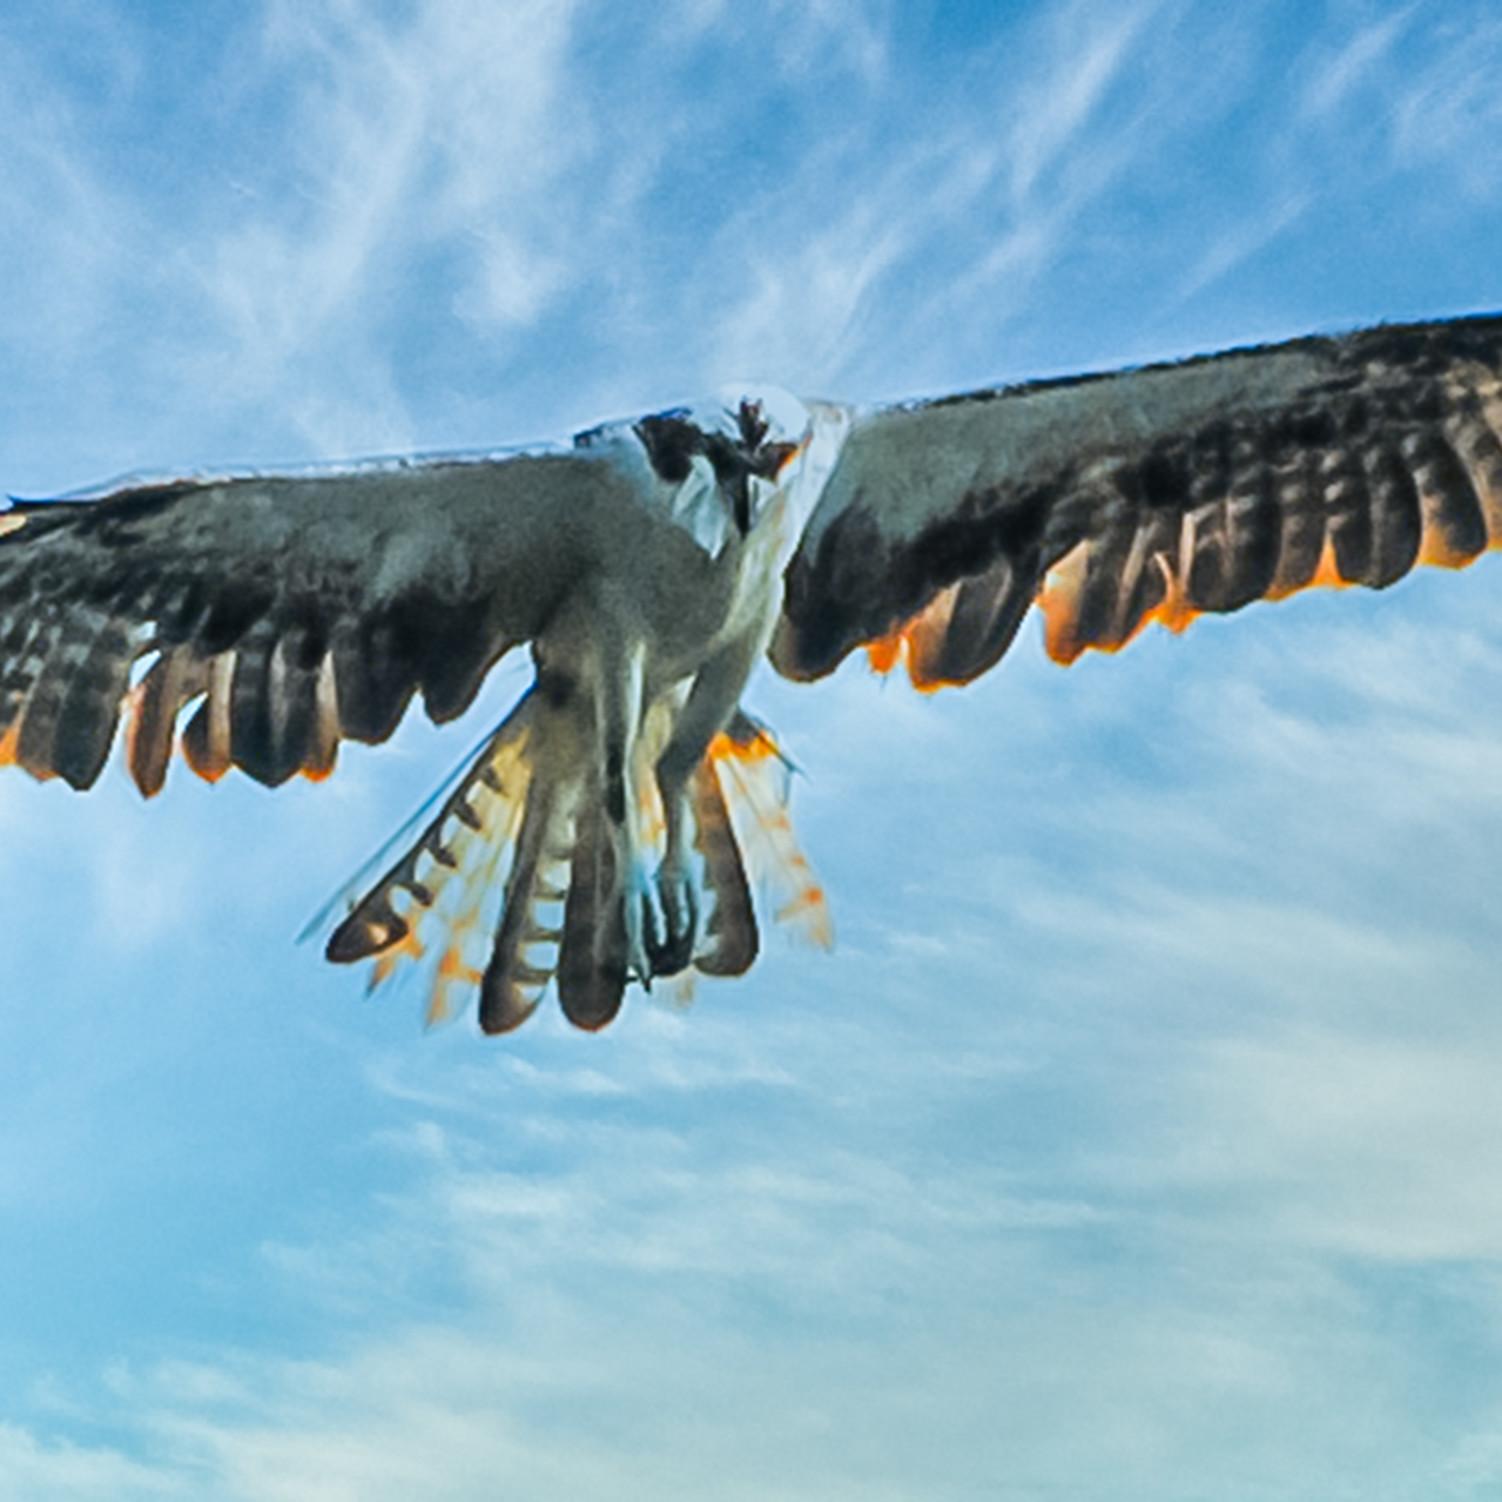 Osprey hovering 1 fxqnic